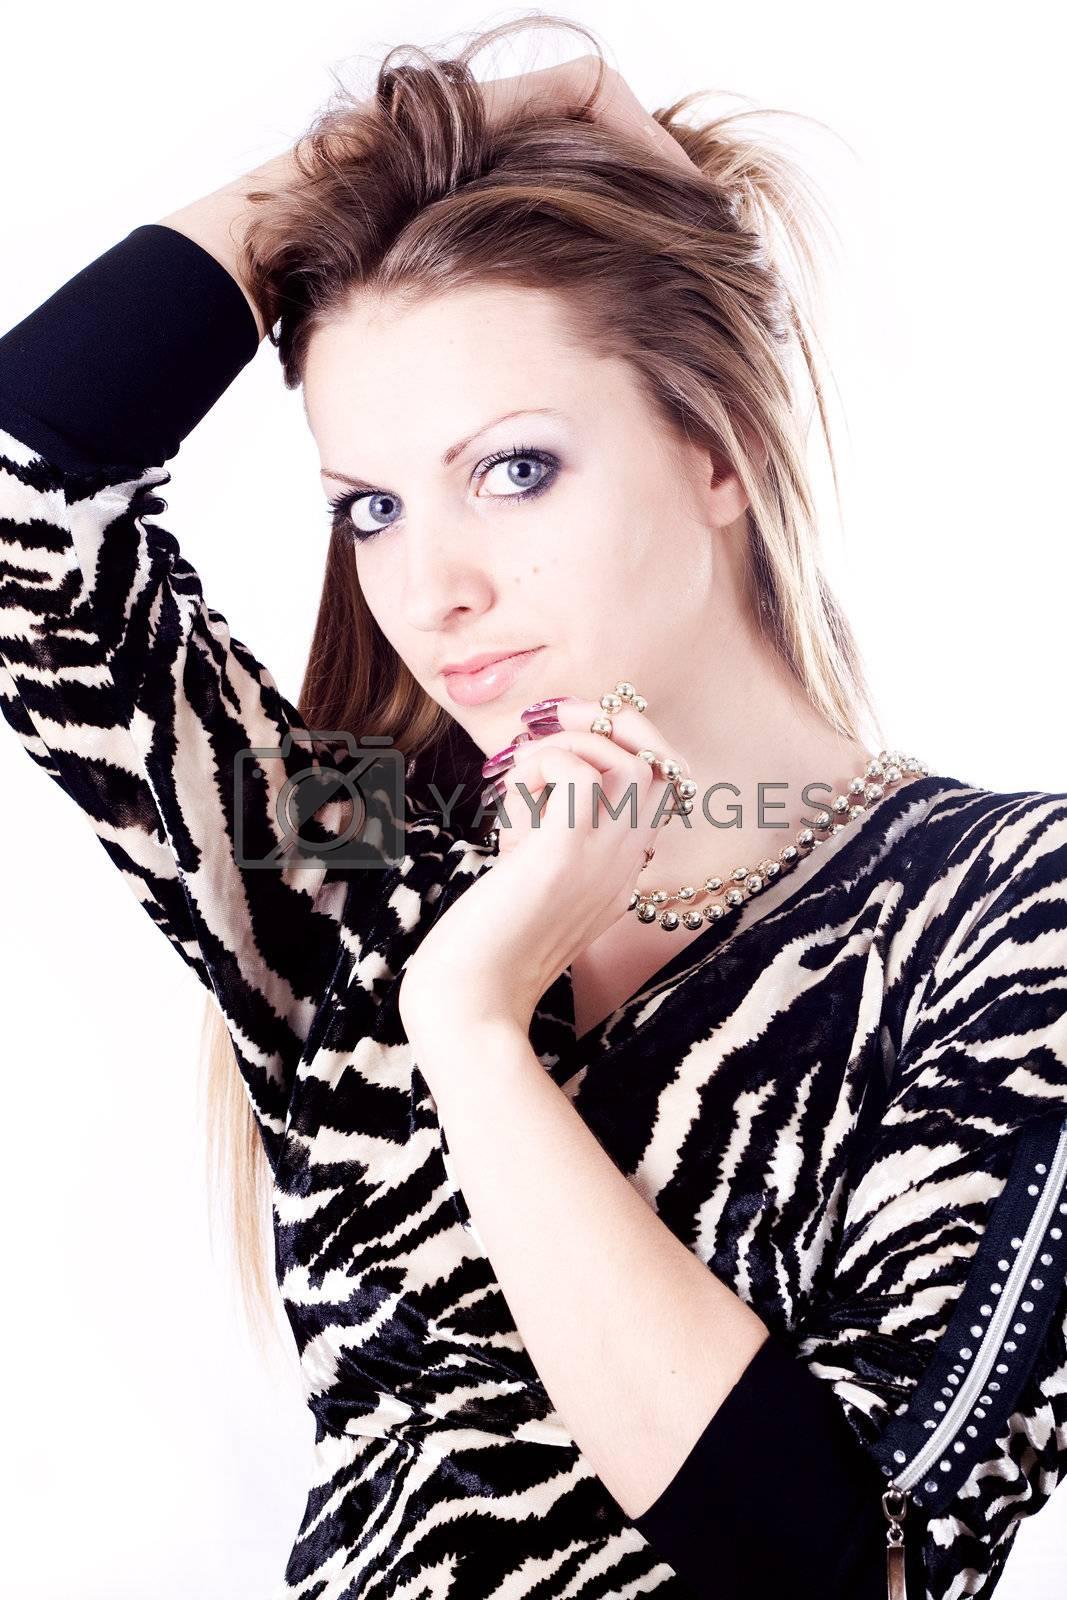 Beautiful girl isolated on white background